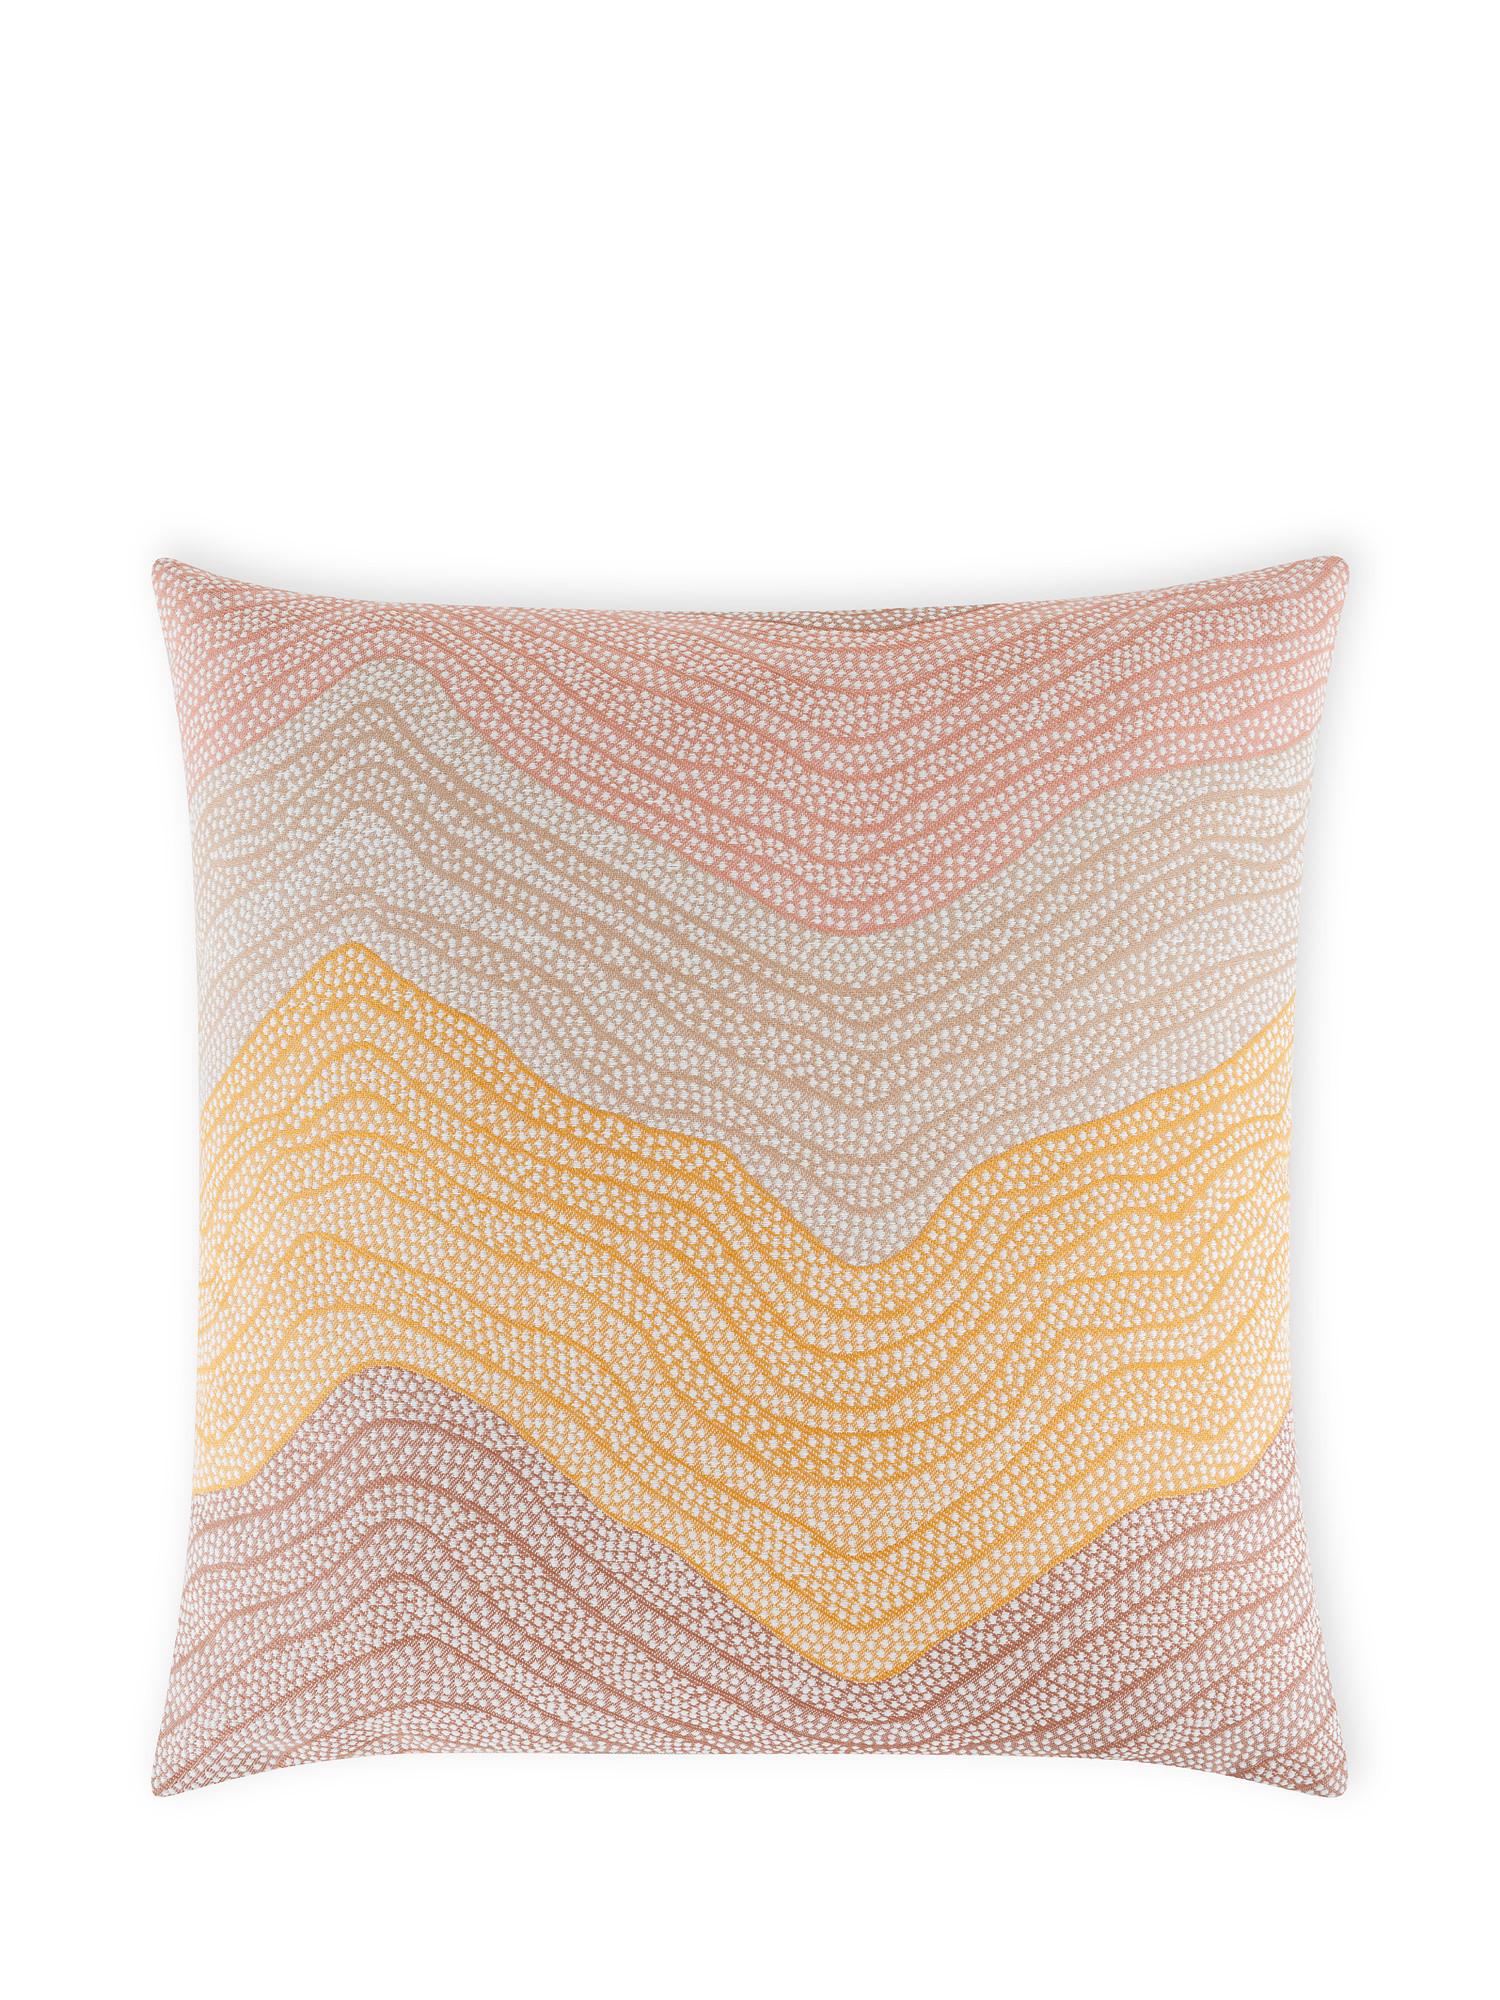 Cuscino tessuto jacquard spalmato 43x43cm, Multicolor, large image number 0